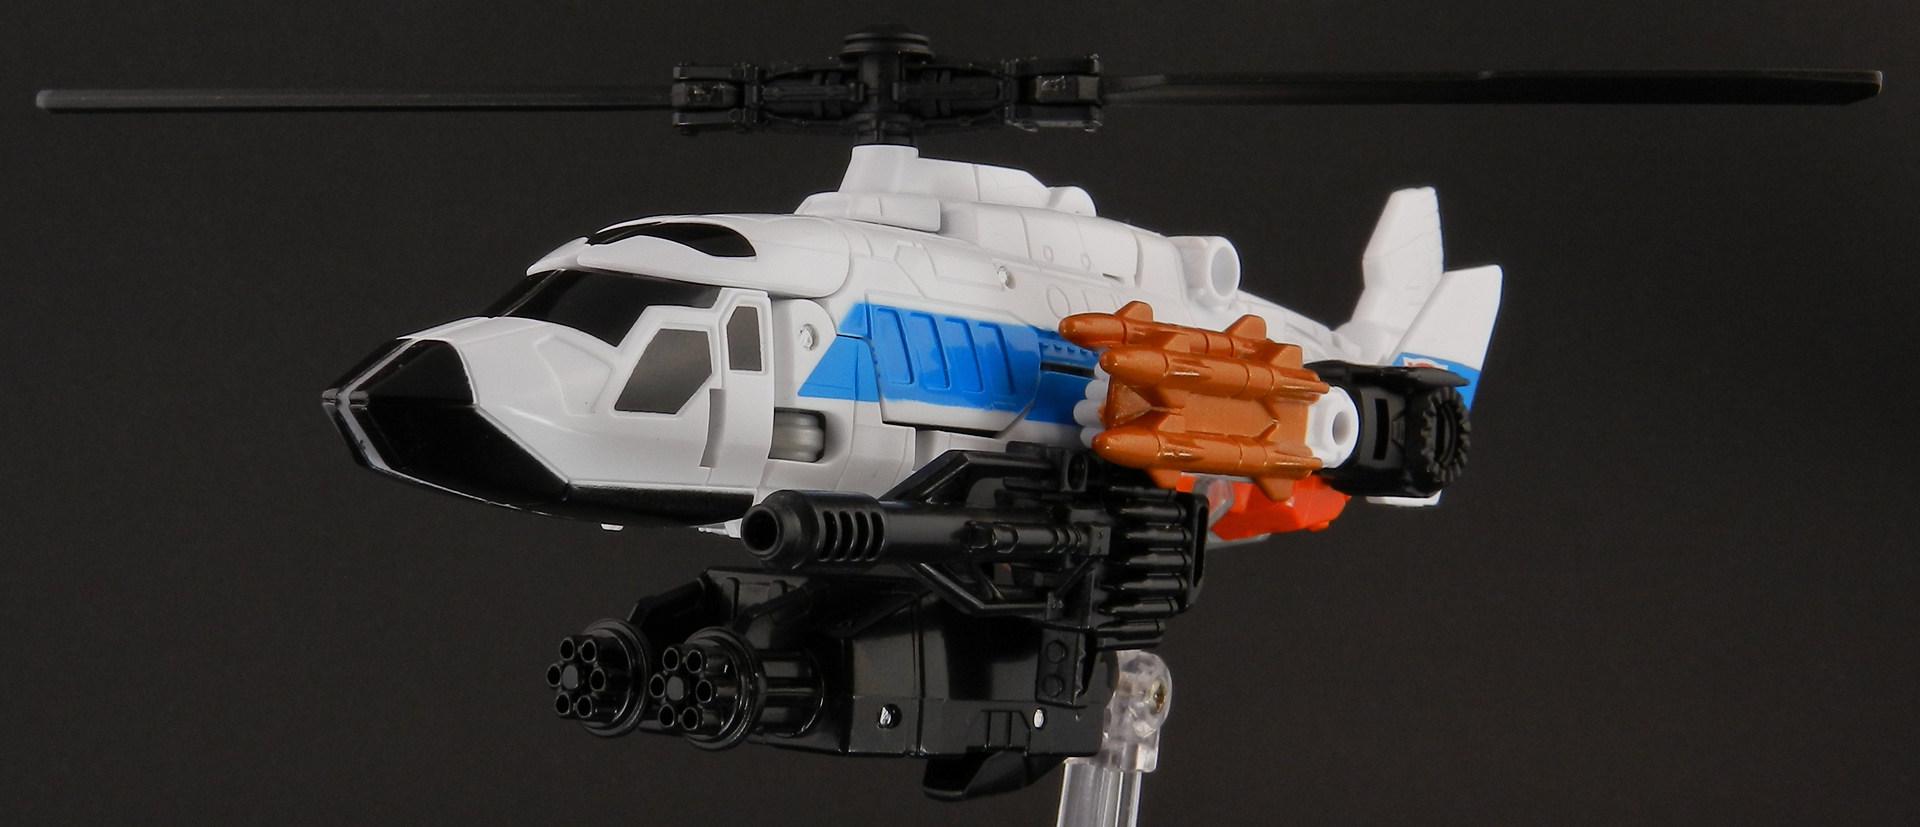 Transformers Alpha Bravo - Combiner Wars - Hasbro (CERBERUS Review) Alpha-Bravo-Helicopter-17_1420320241